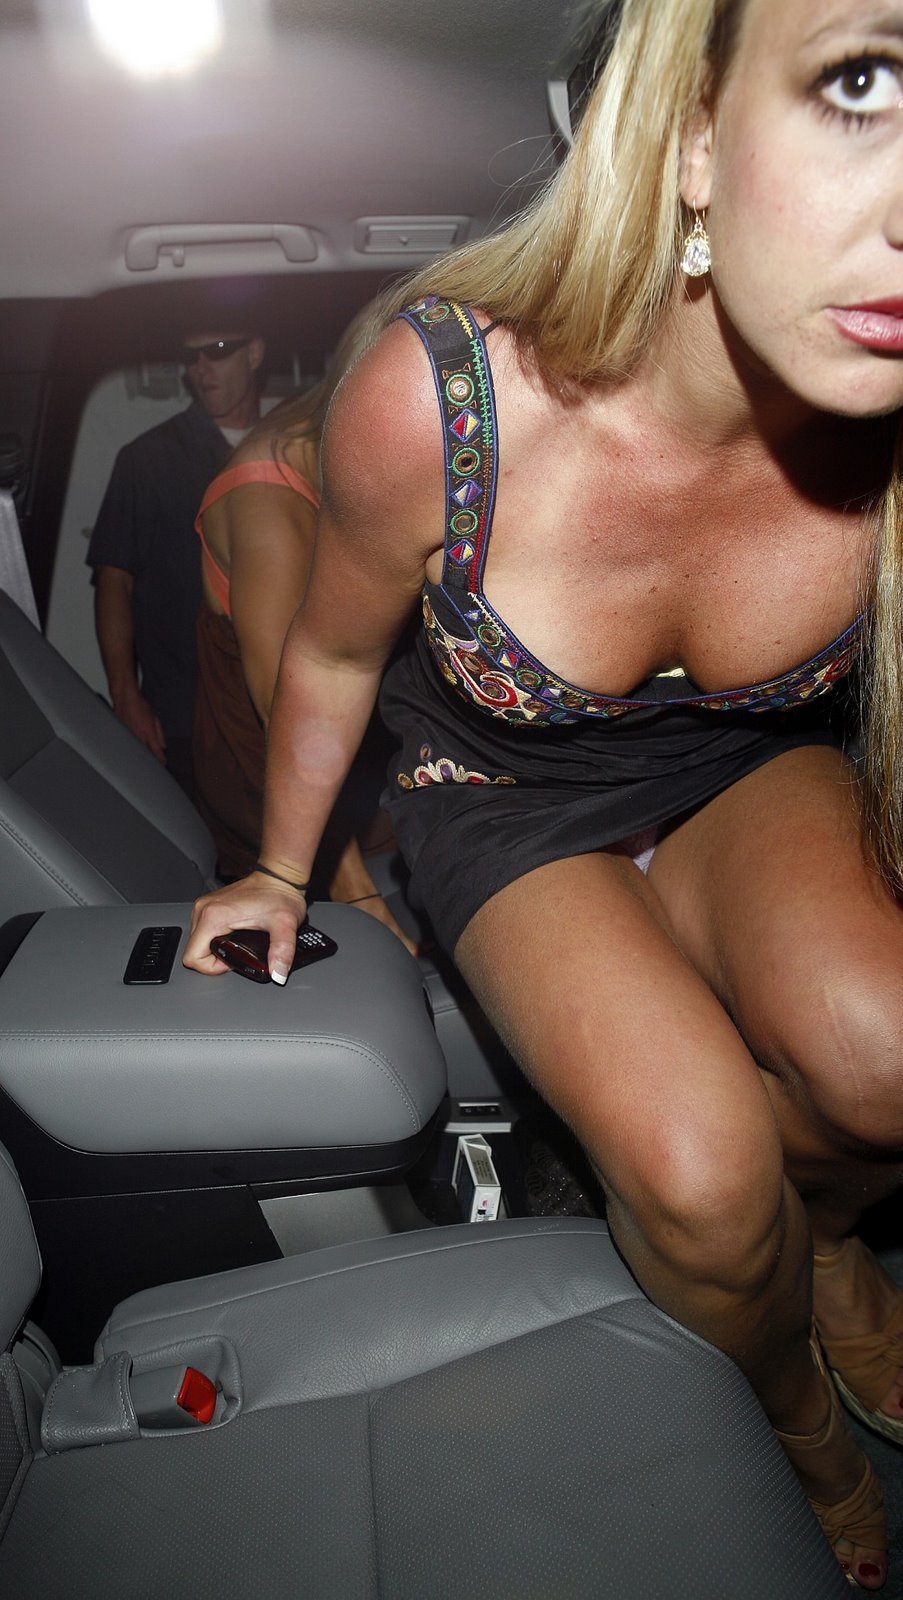 britney-paris-upskirt-photos-slut-bride-nude